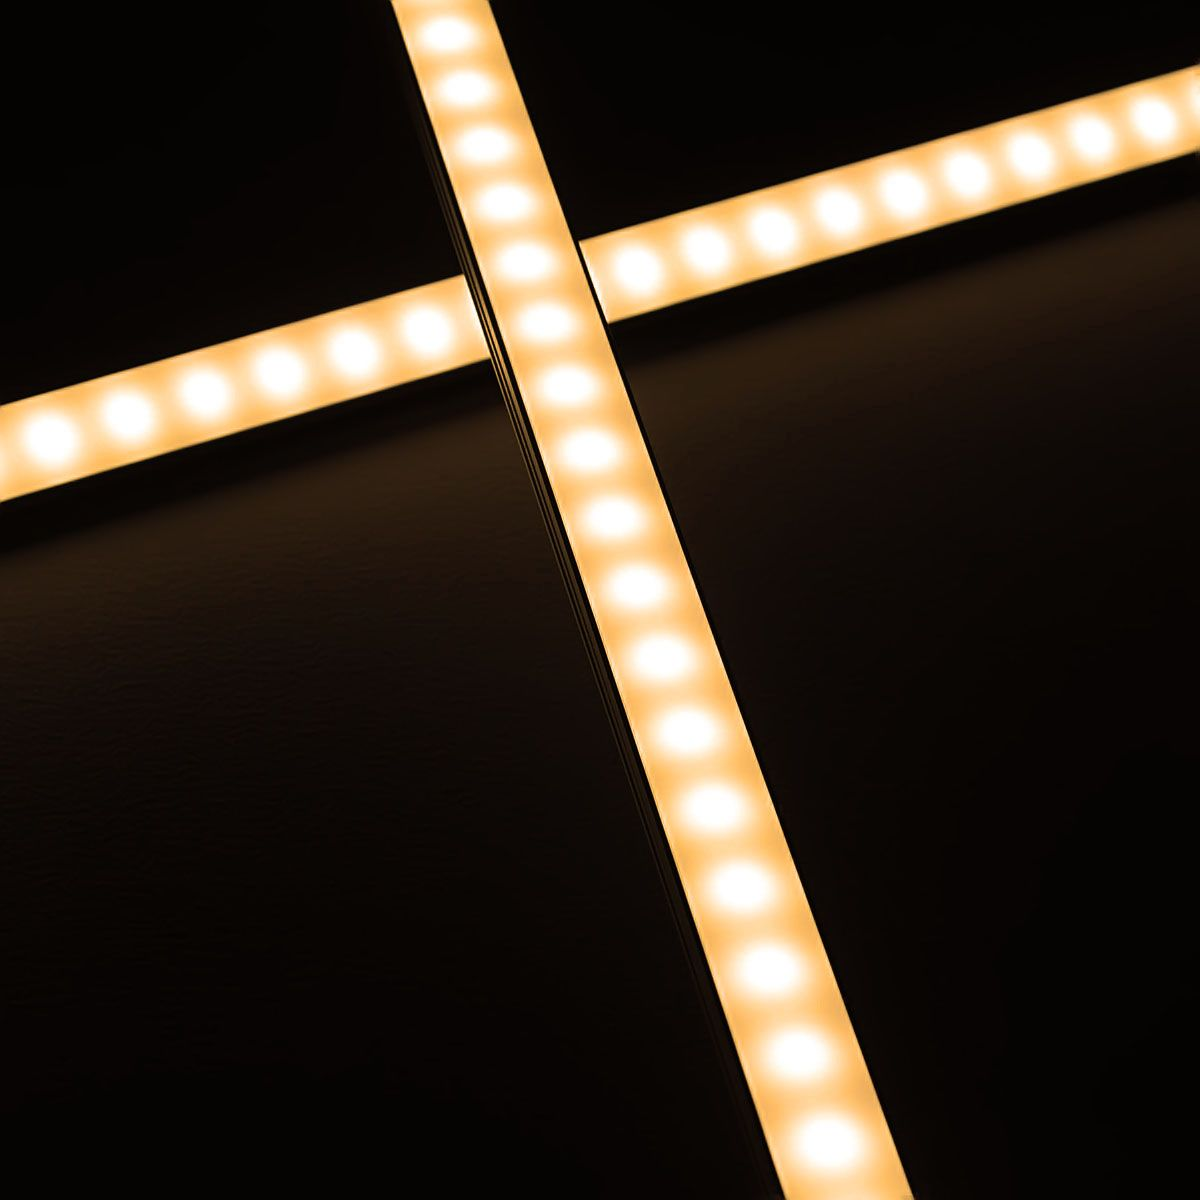 24V wasserfeste Aluminium LED Leiste – warmweiß – 100cm – diffuse Abdeckung – IP65